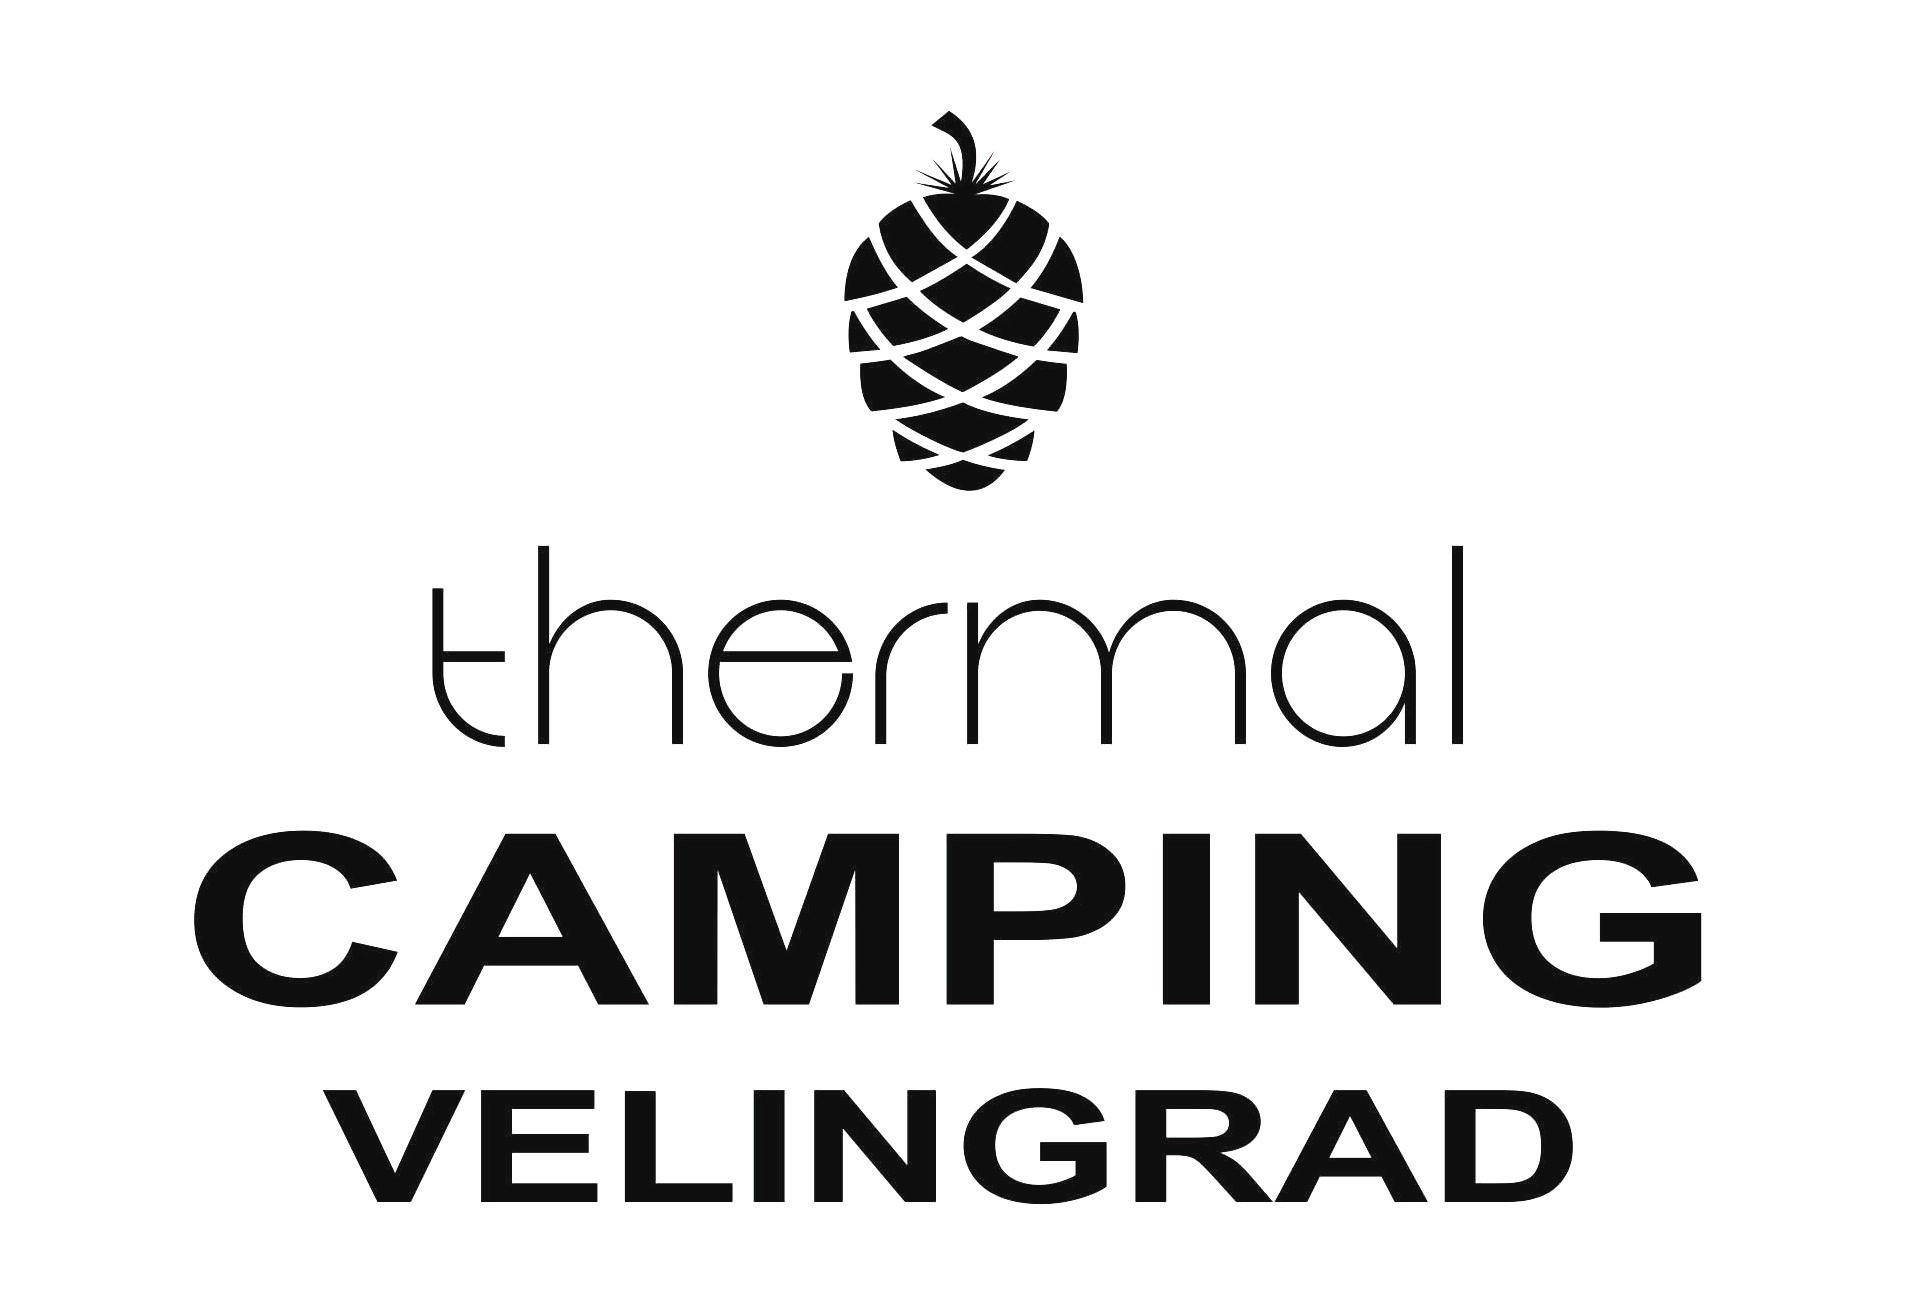 Thermal Camping Velingrad